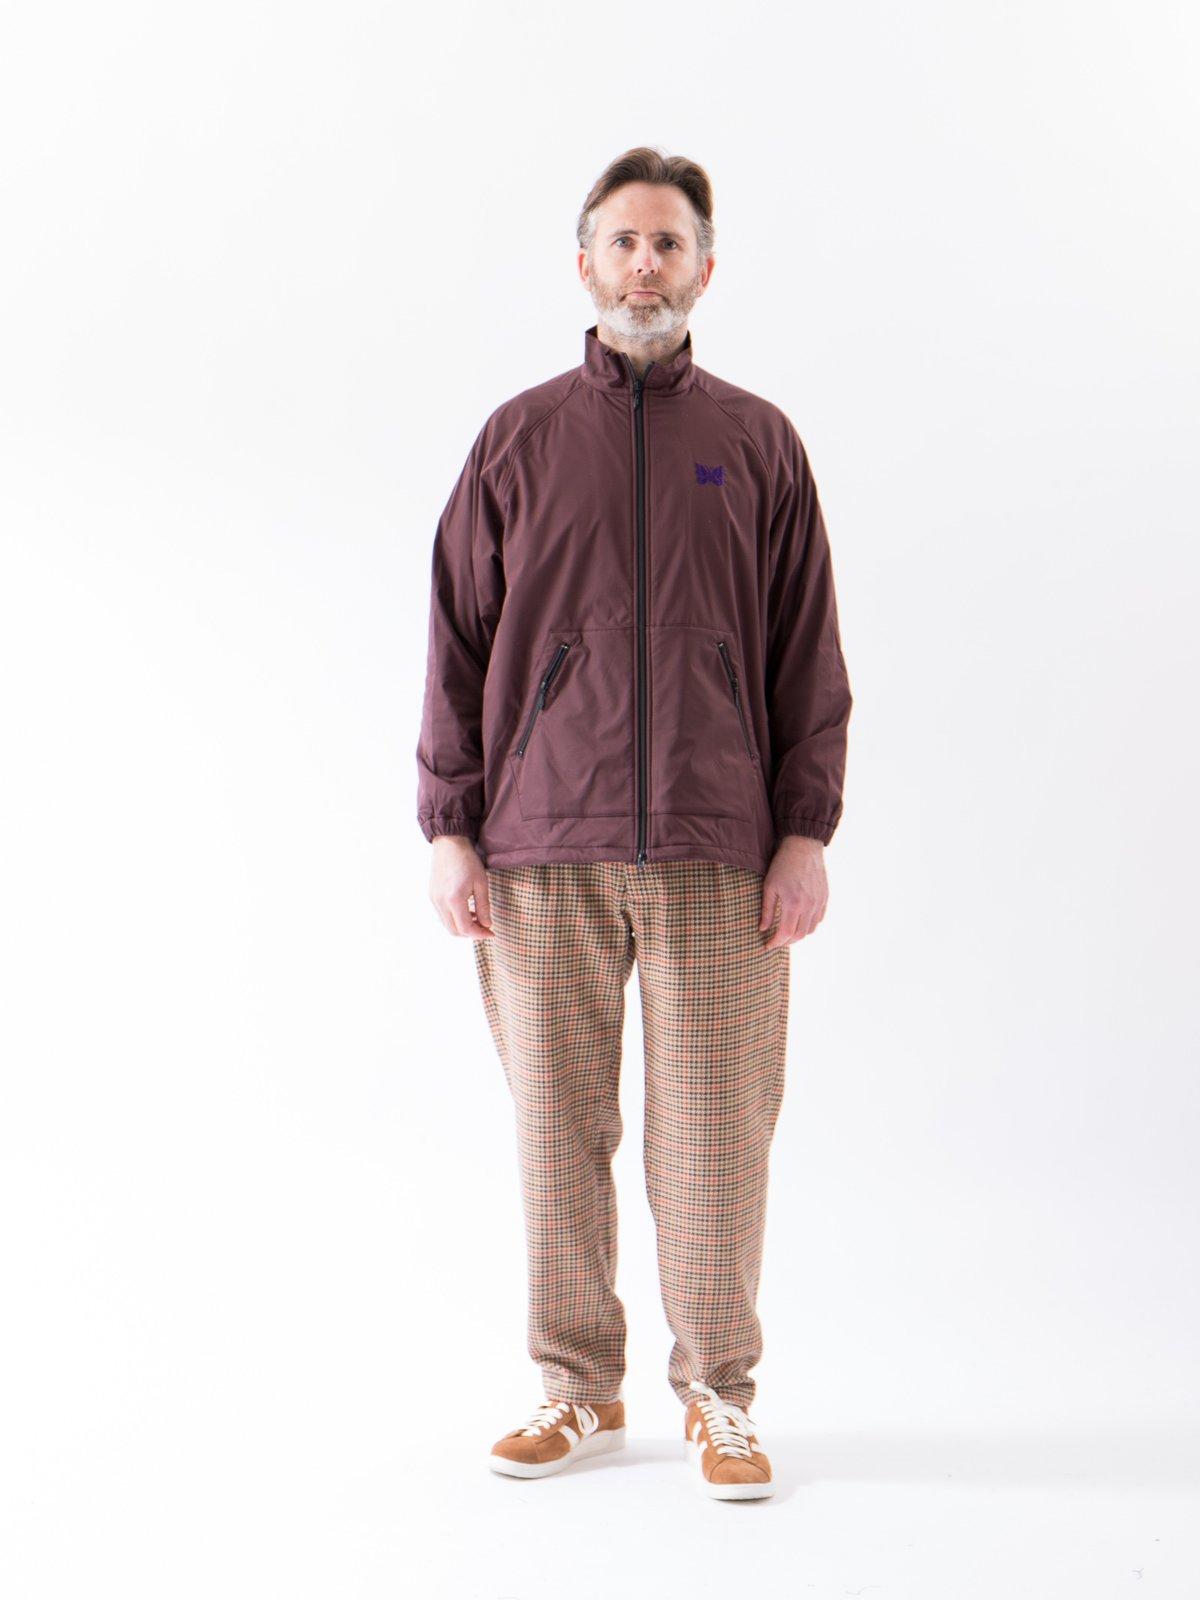 Bordeaux Jog Jacket - Image 2